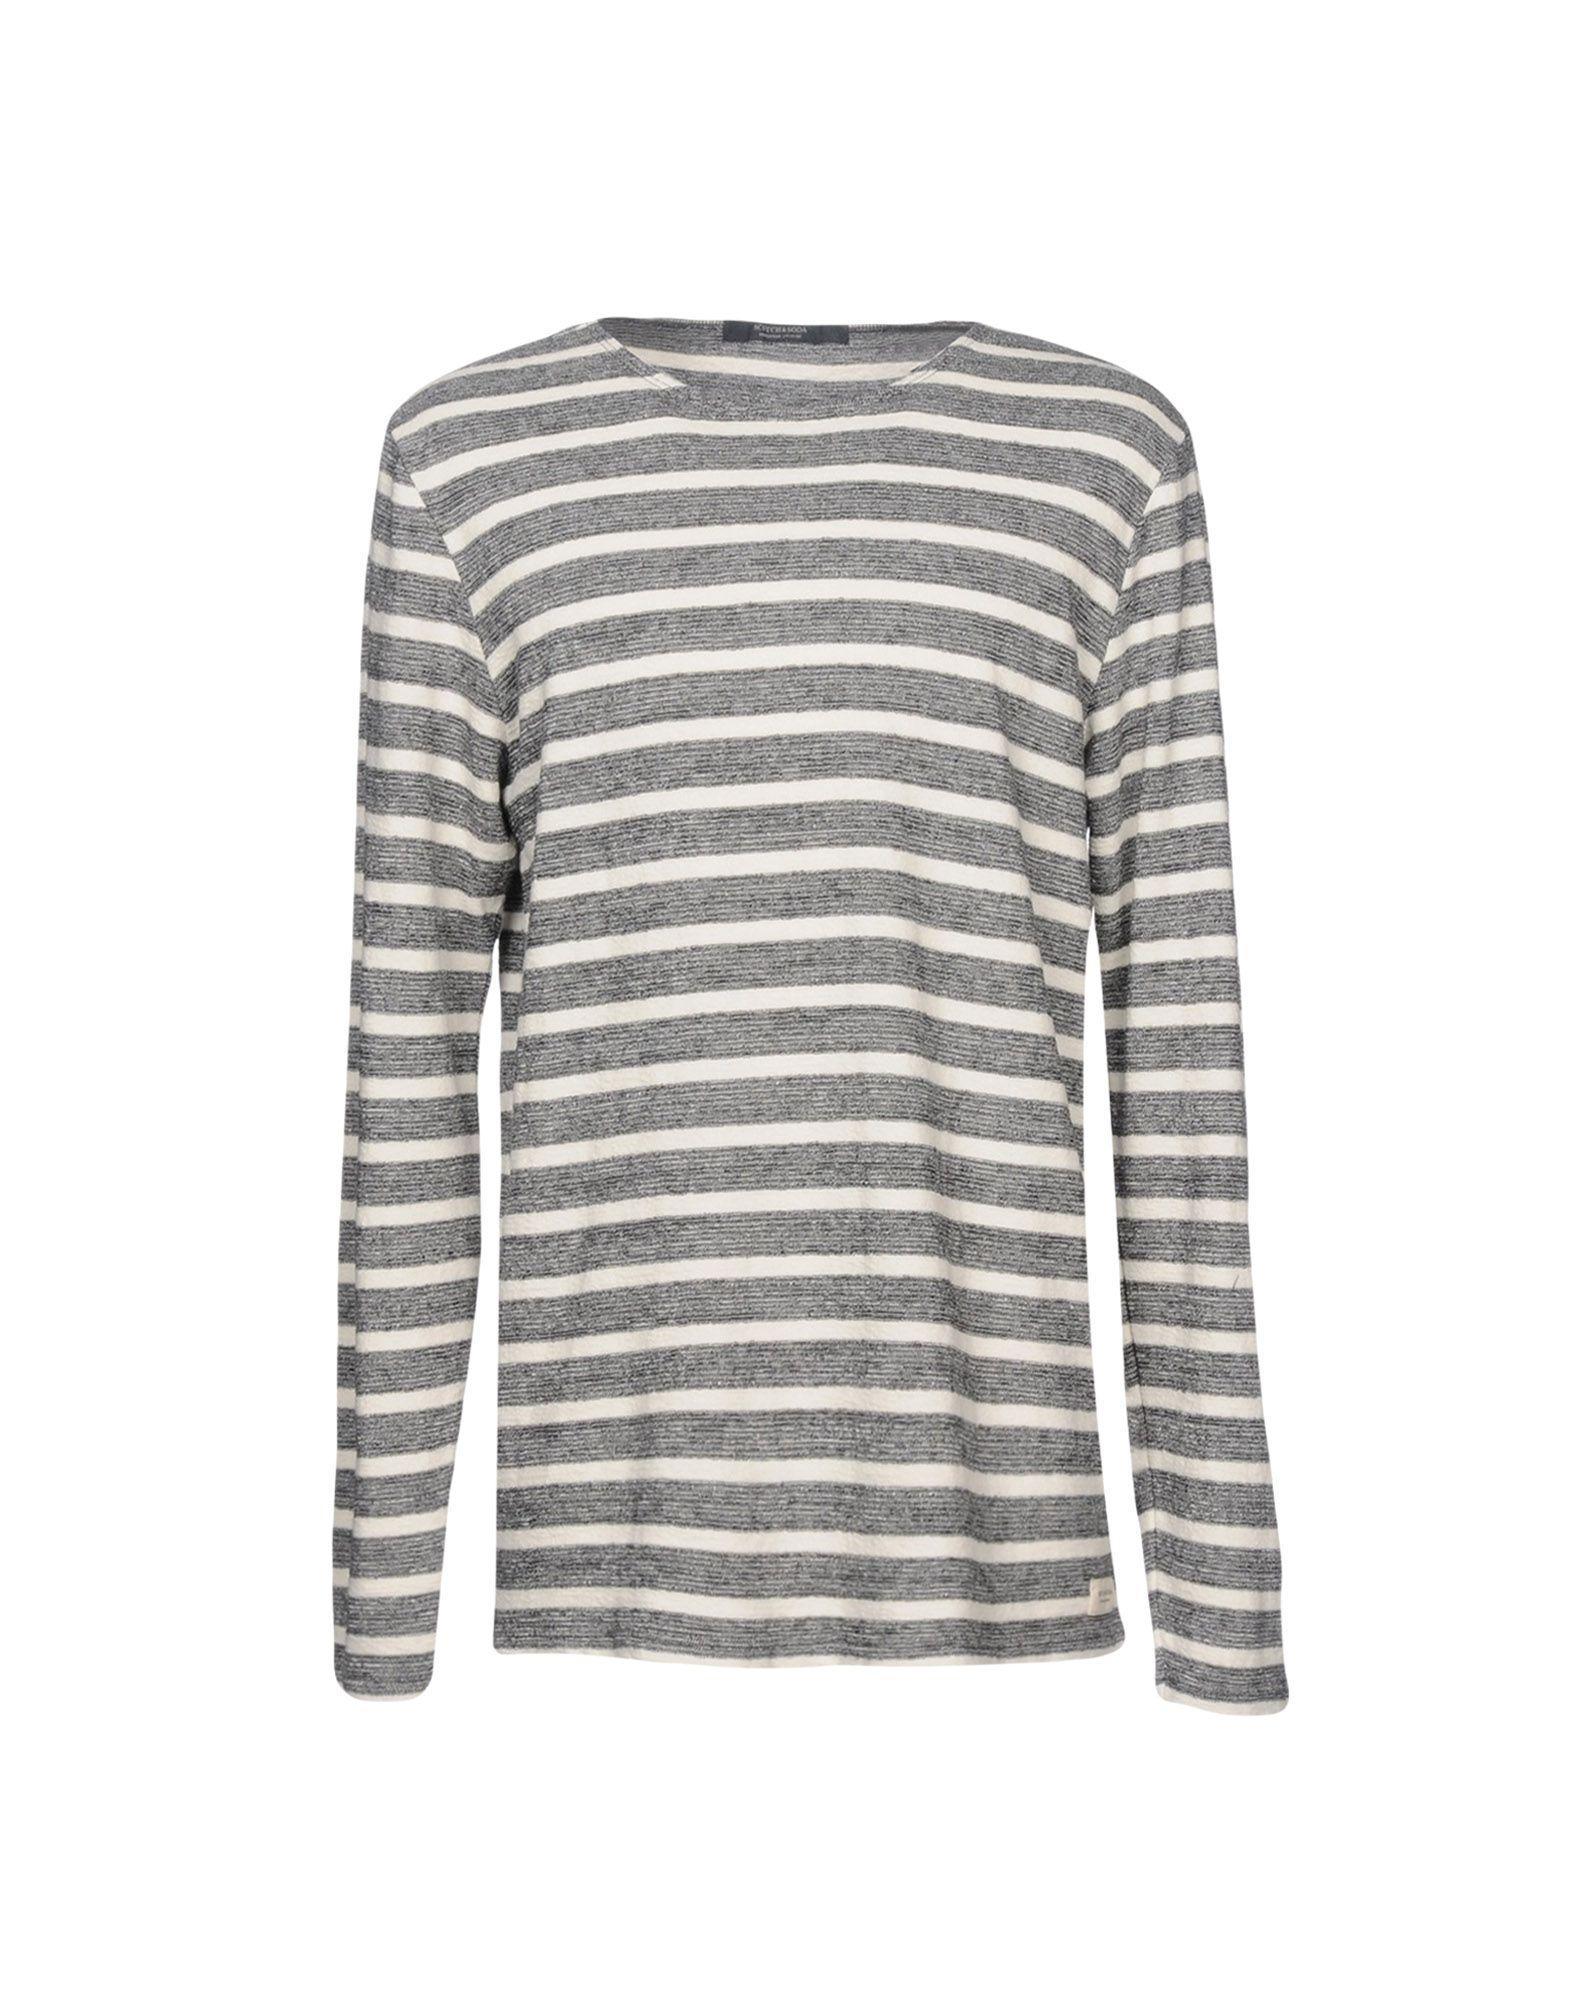 Scotch & Soda Sweater In Steel Grey